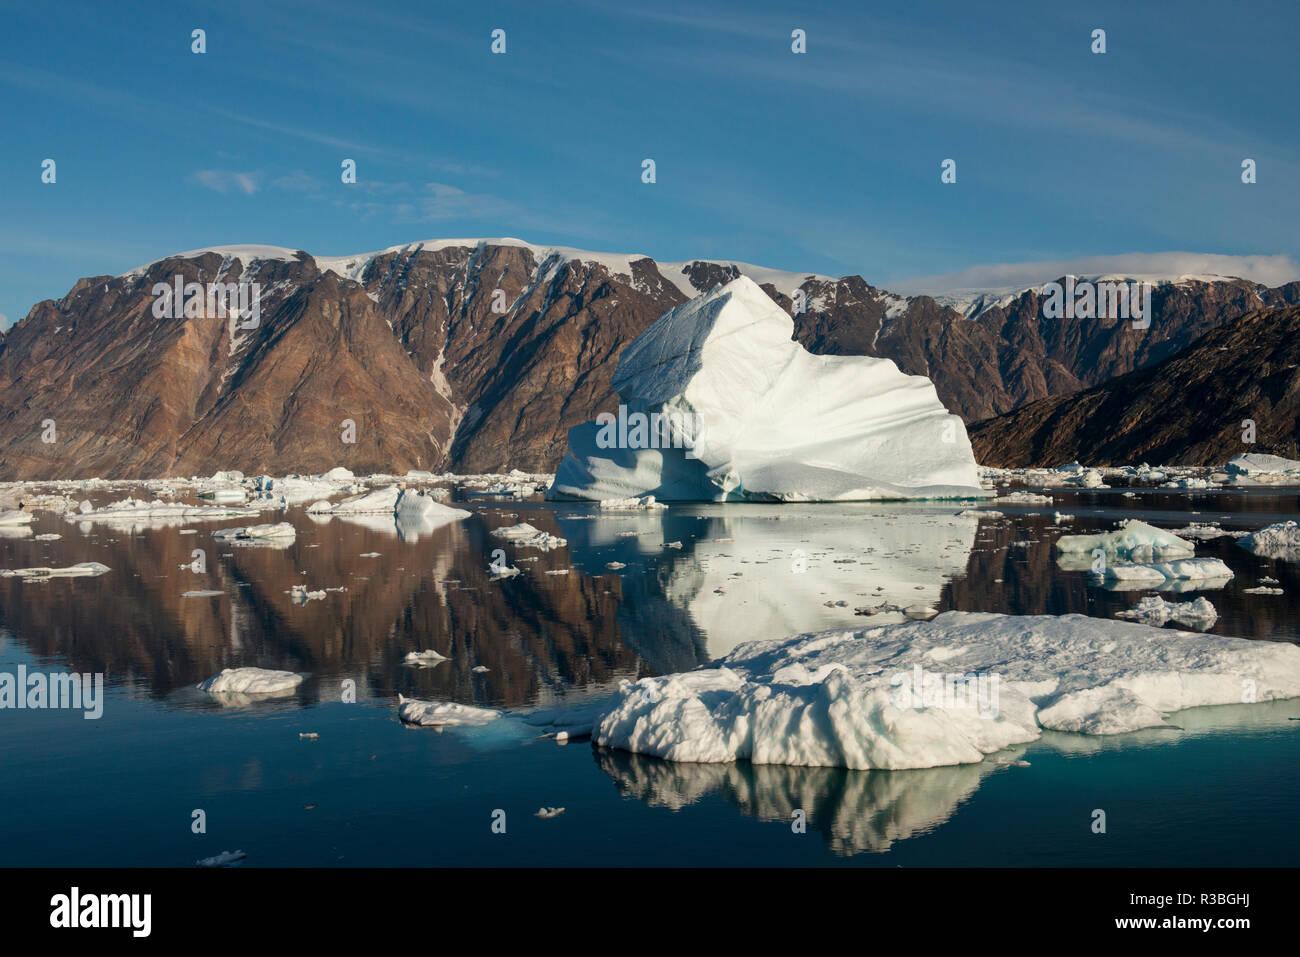 Eastern Greenland, Scoresbysund, aka Scoresby Sund. Scenic ice filled Oer Fjord. Stock Photo